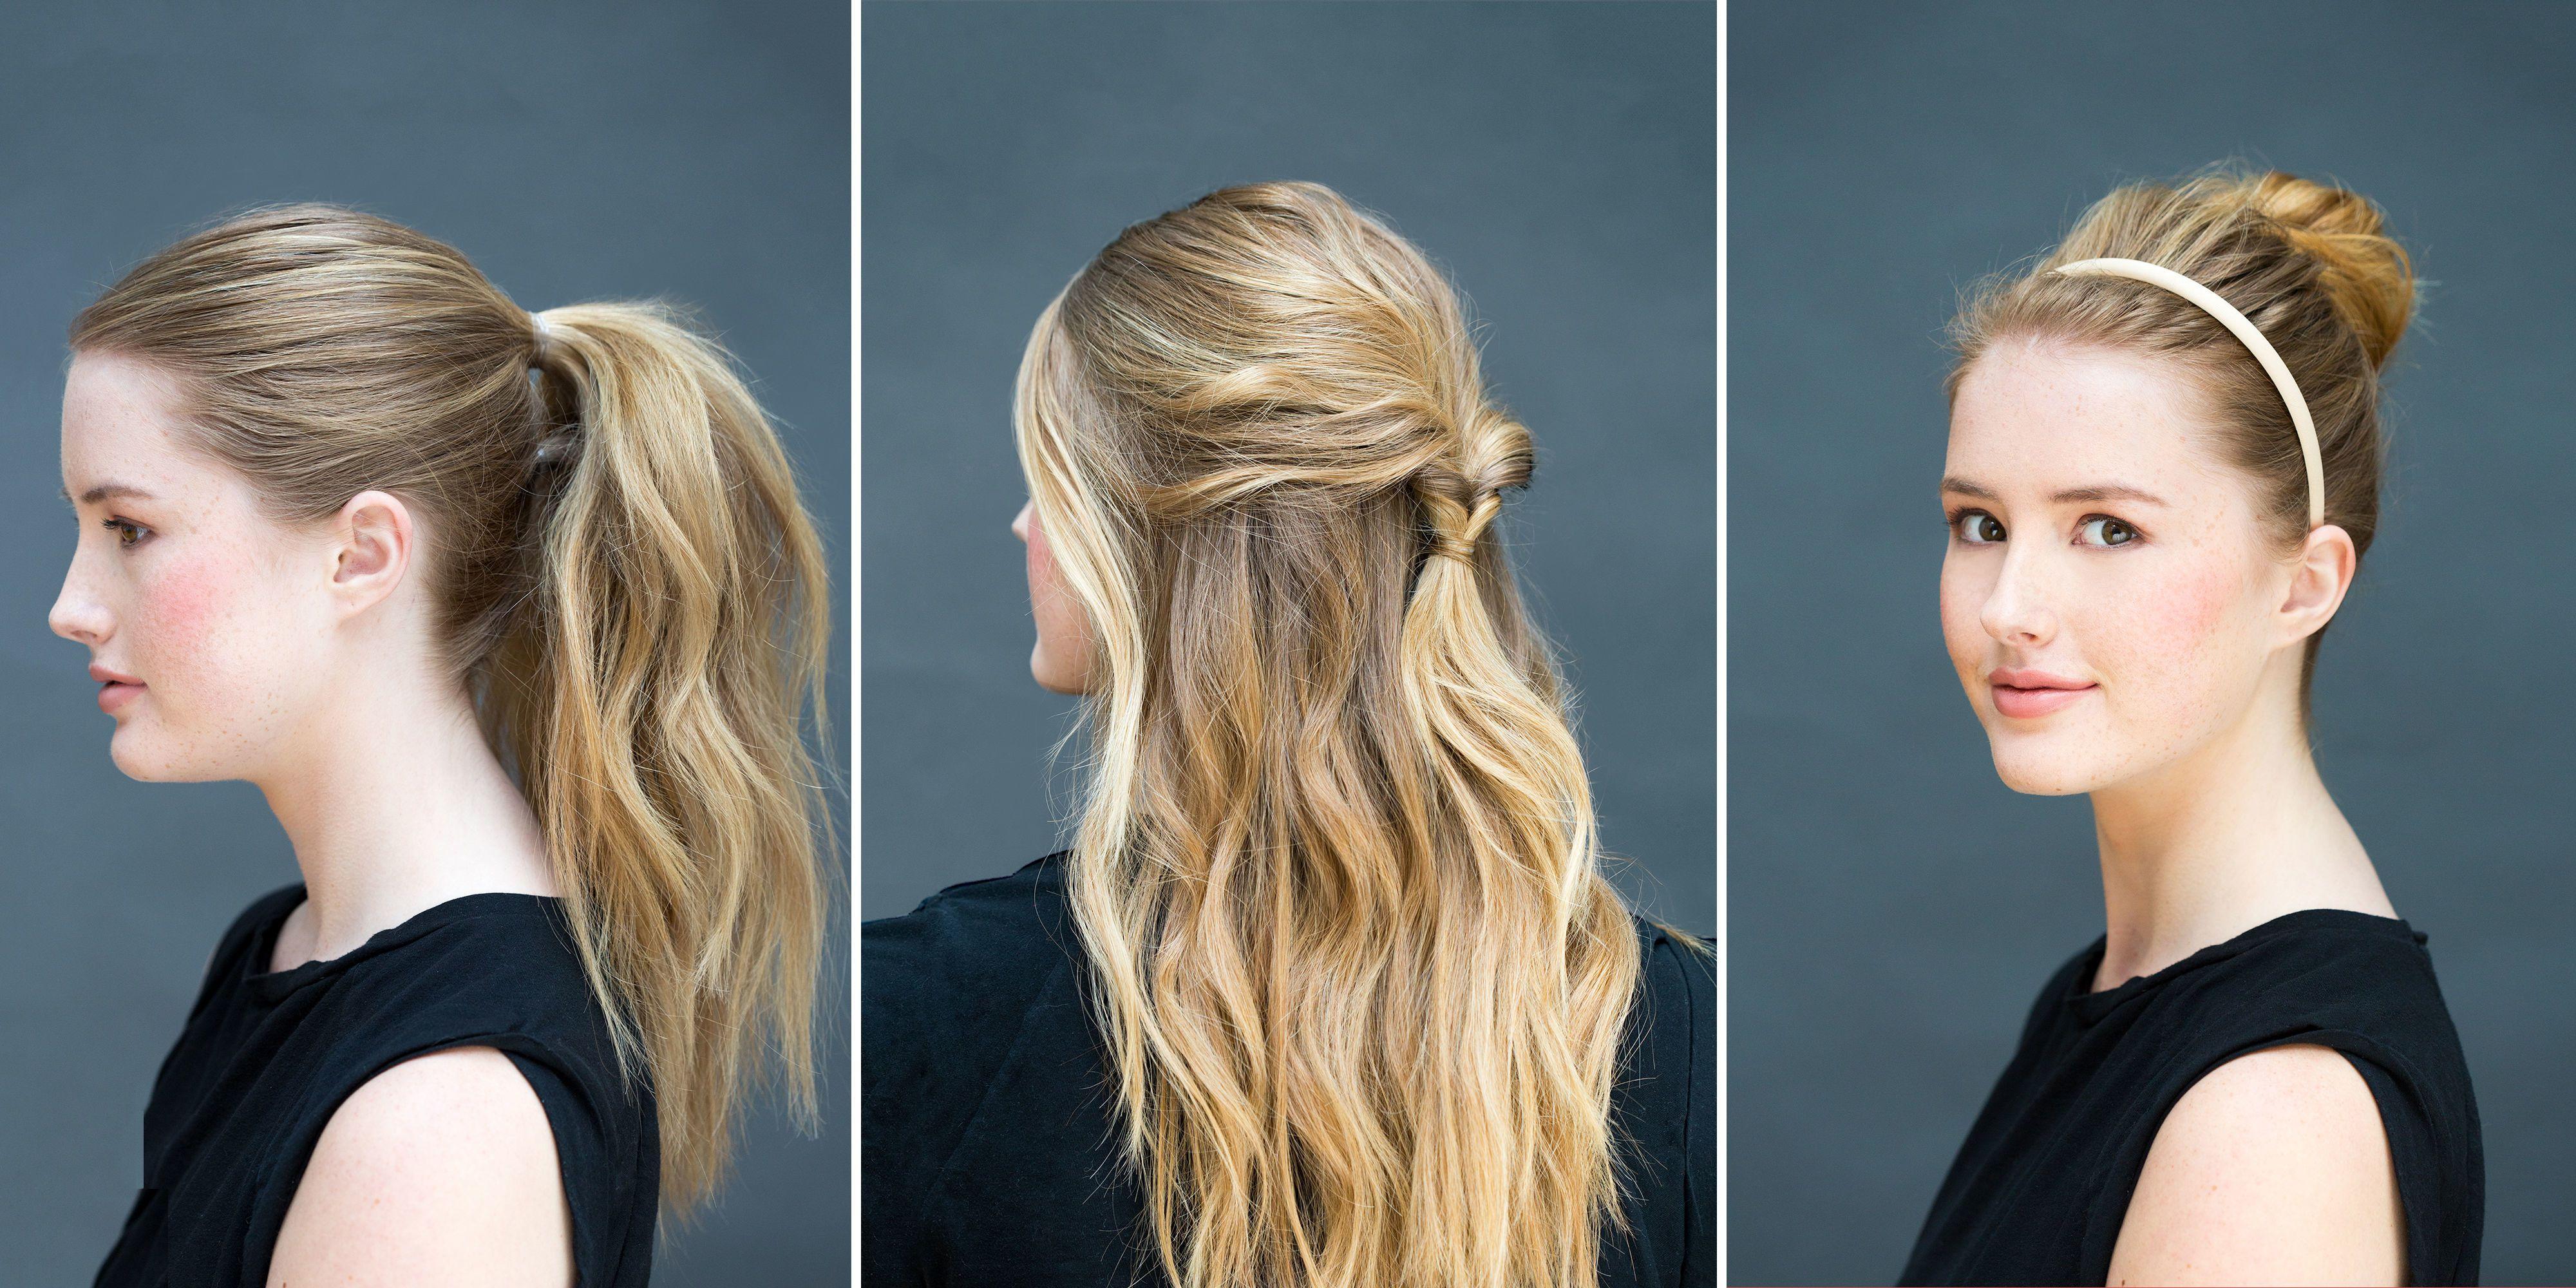 Fashion hairstyles for medium hair at home